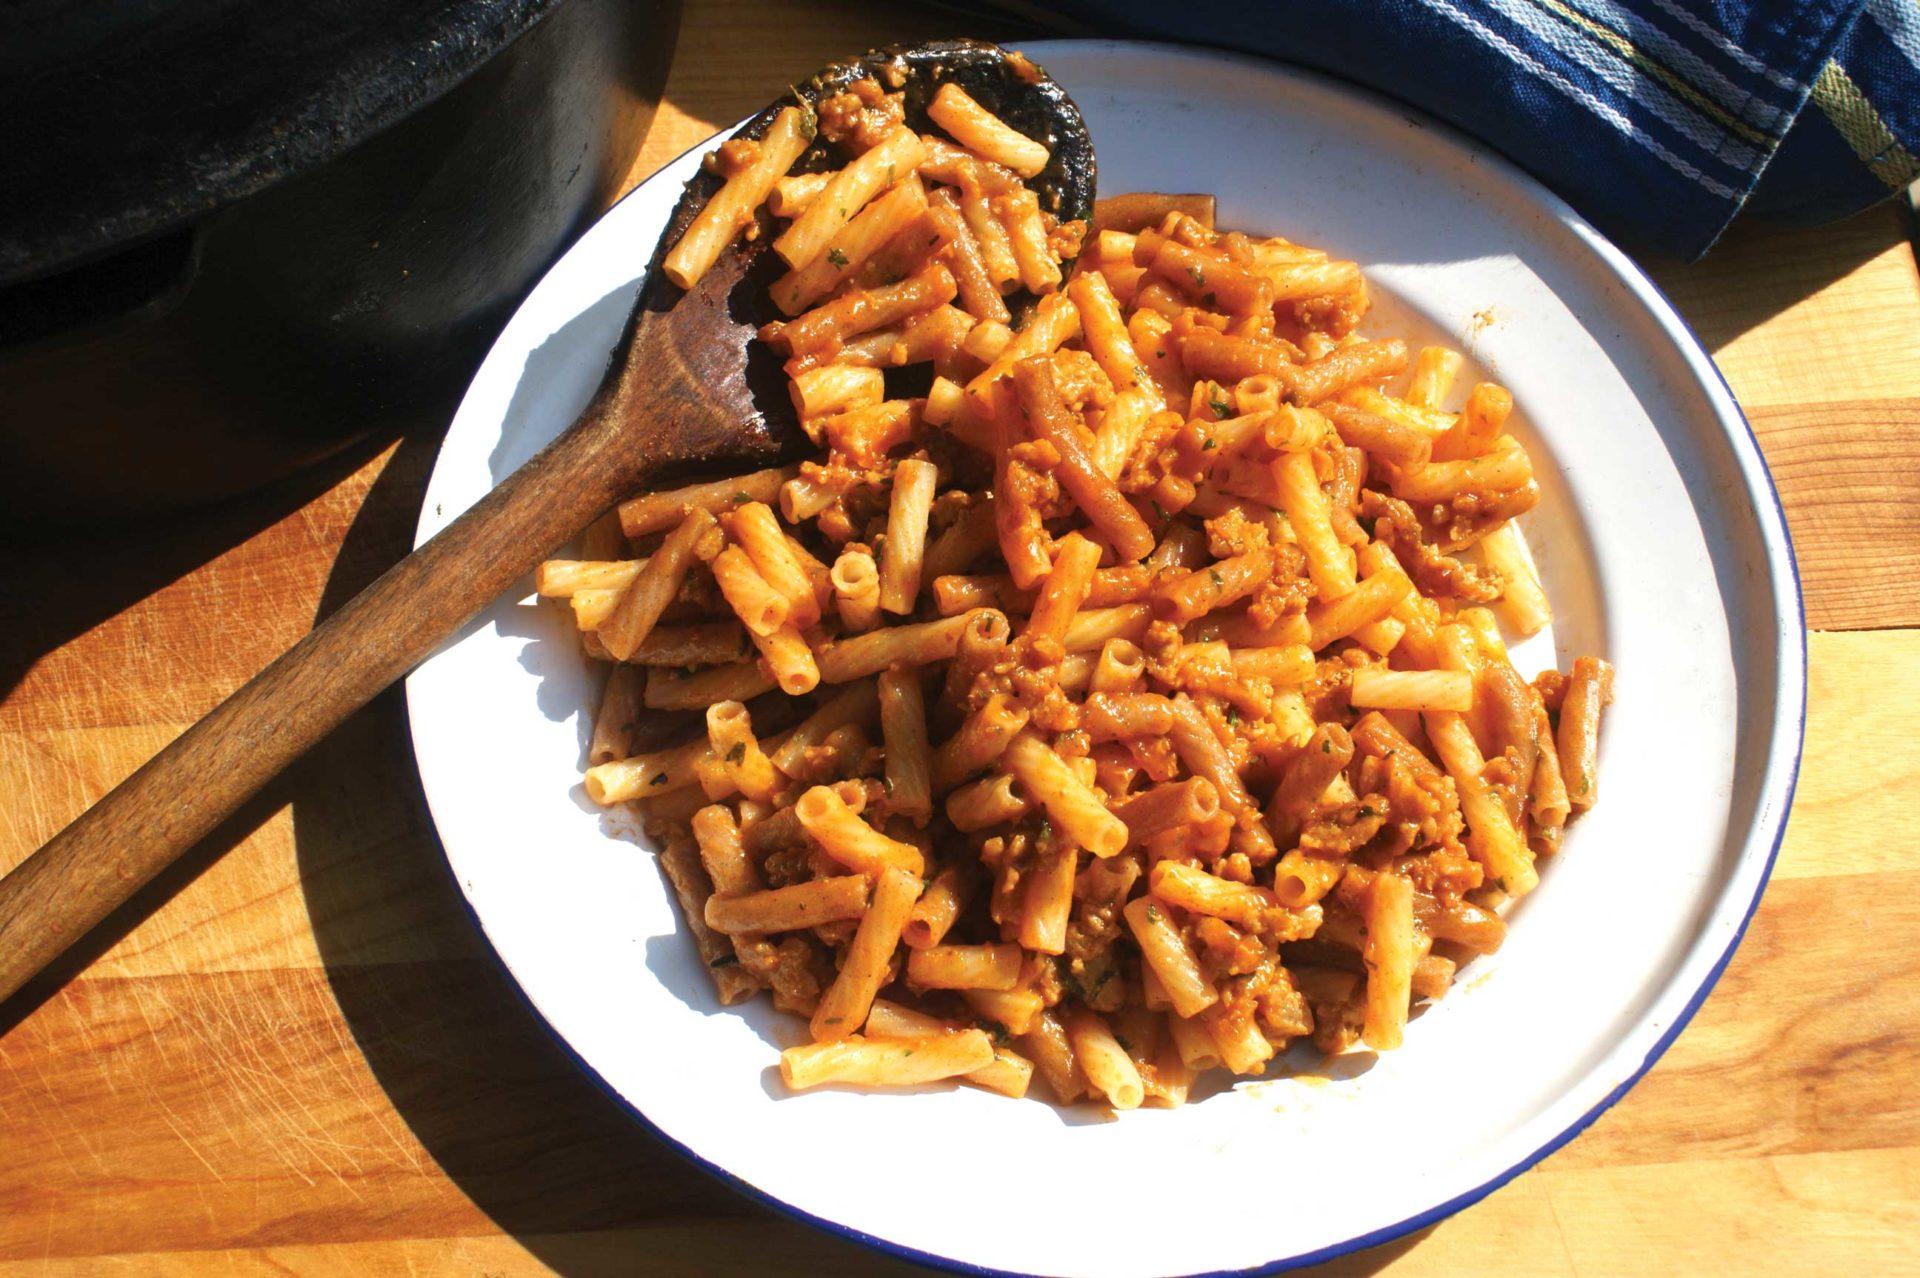 Homemade hamburger helper, made with ground venison quinoa noodles and homemade seasoning mix.